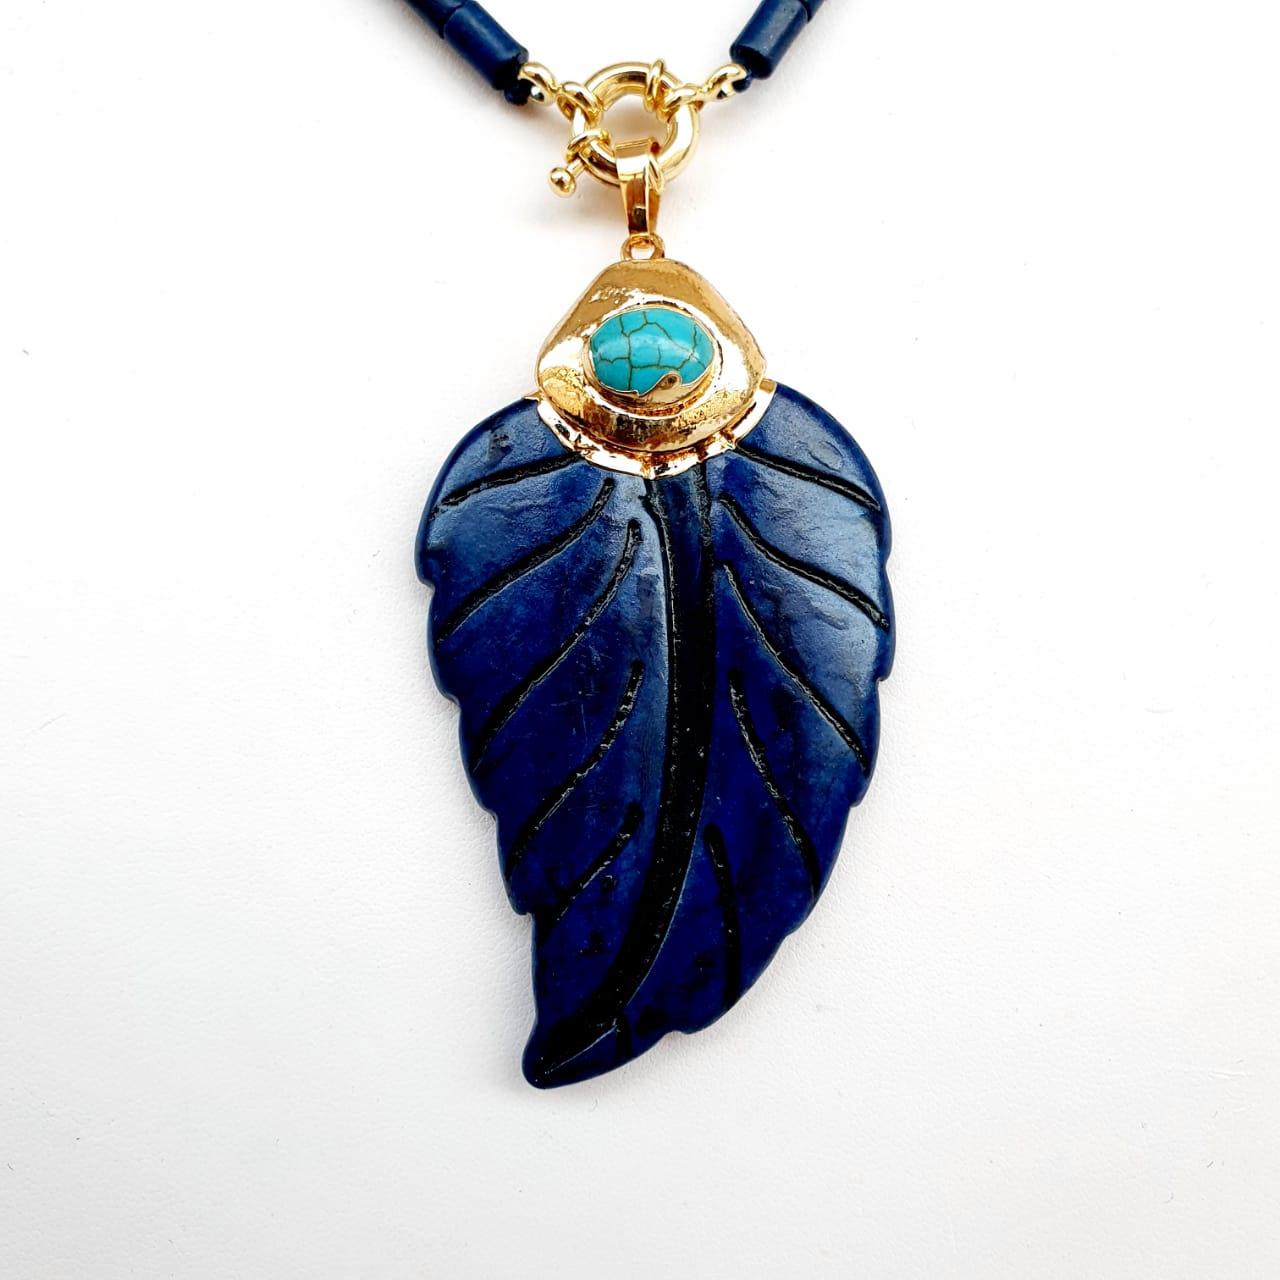 Colar semijoia canutilhos houlita folha Azul 0021